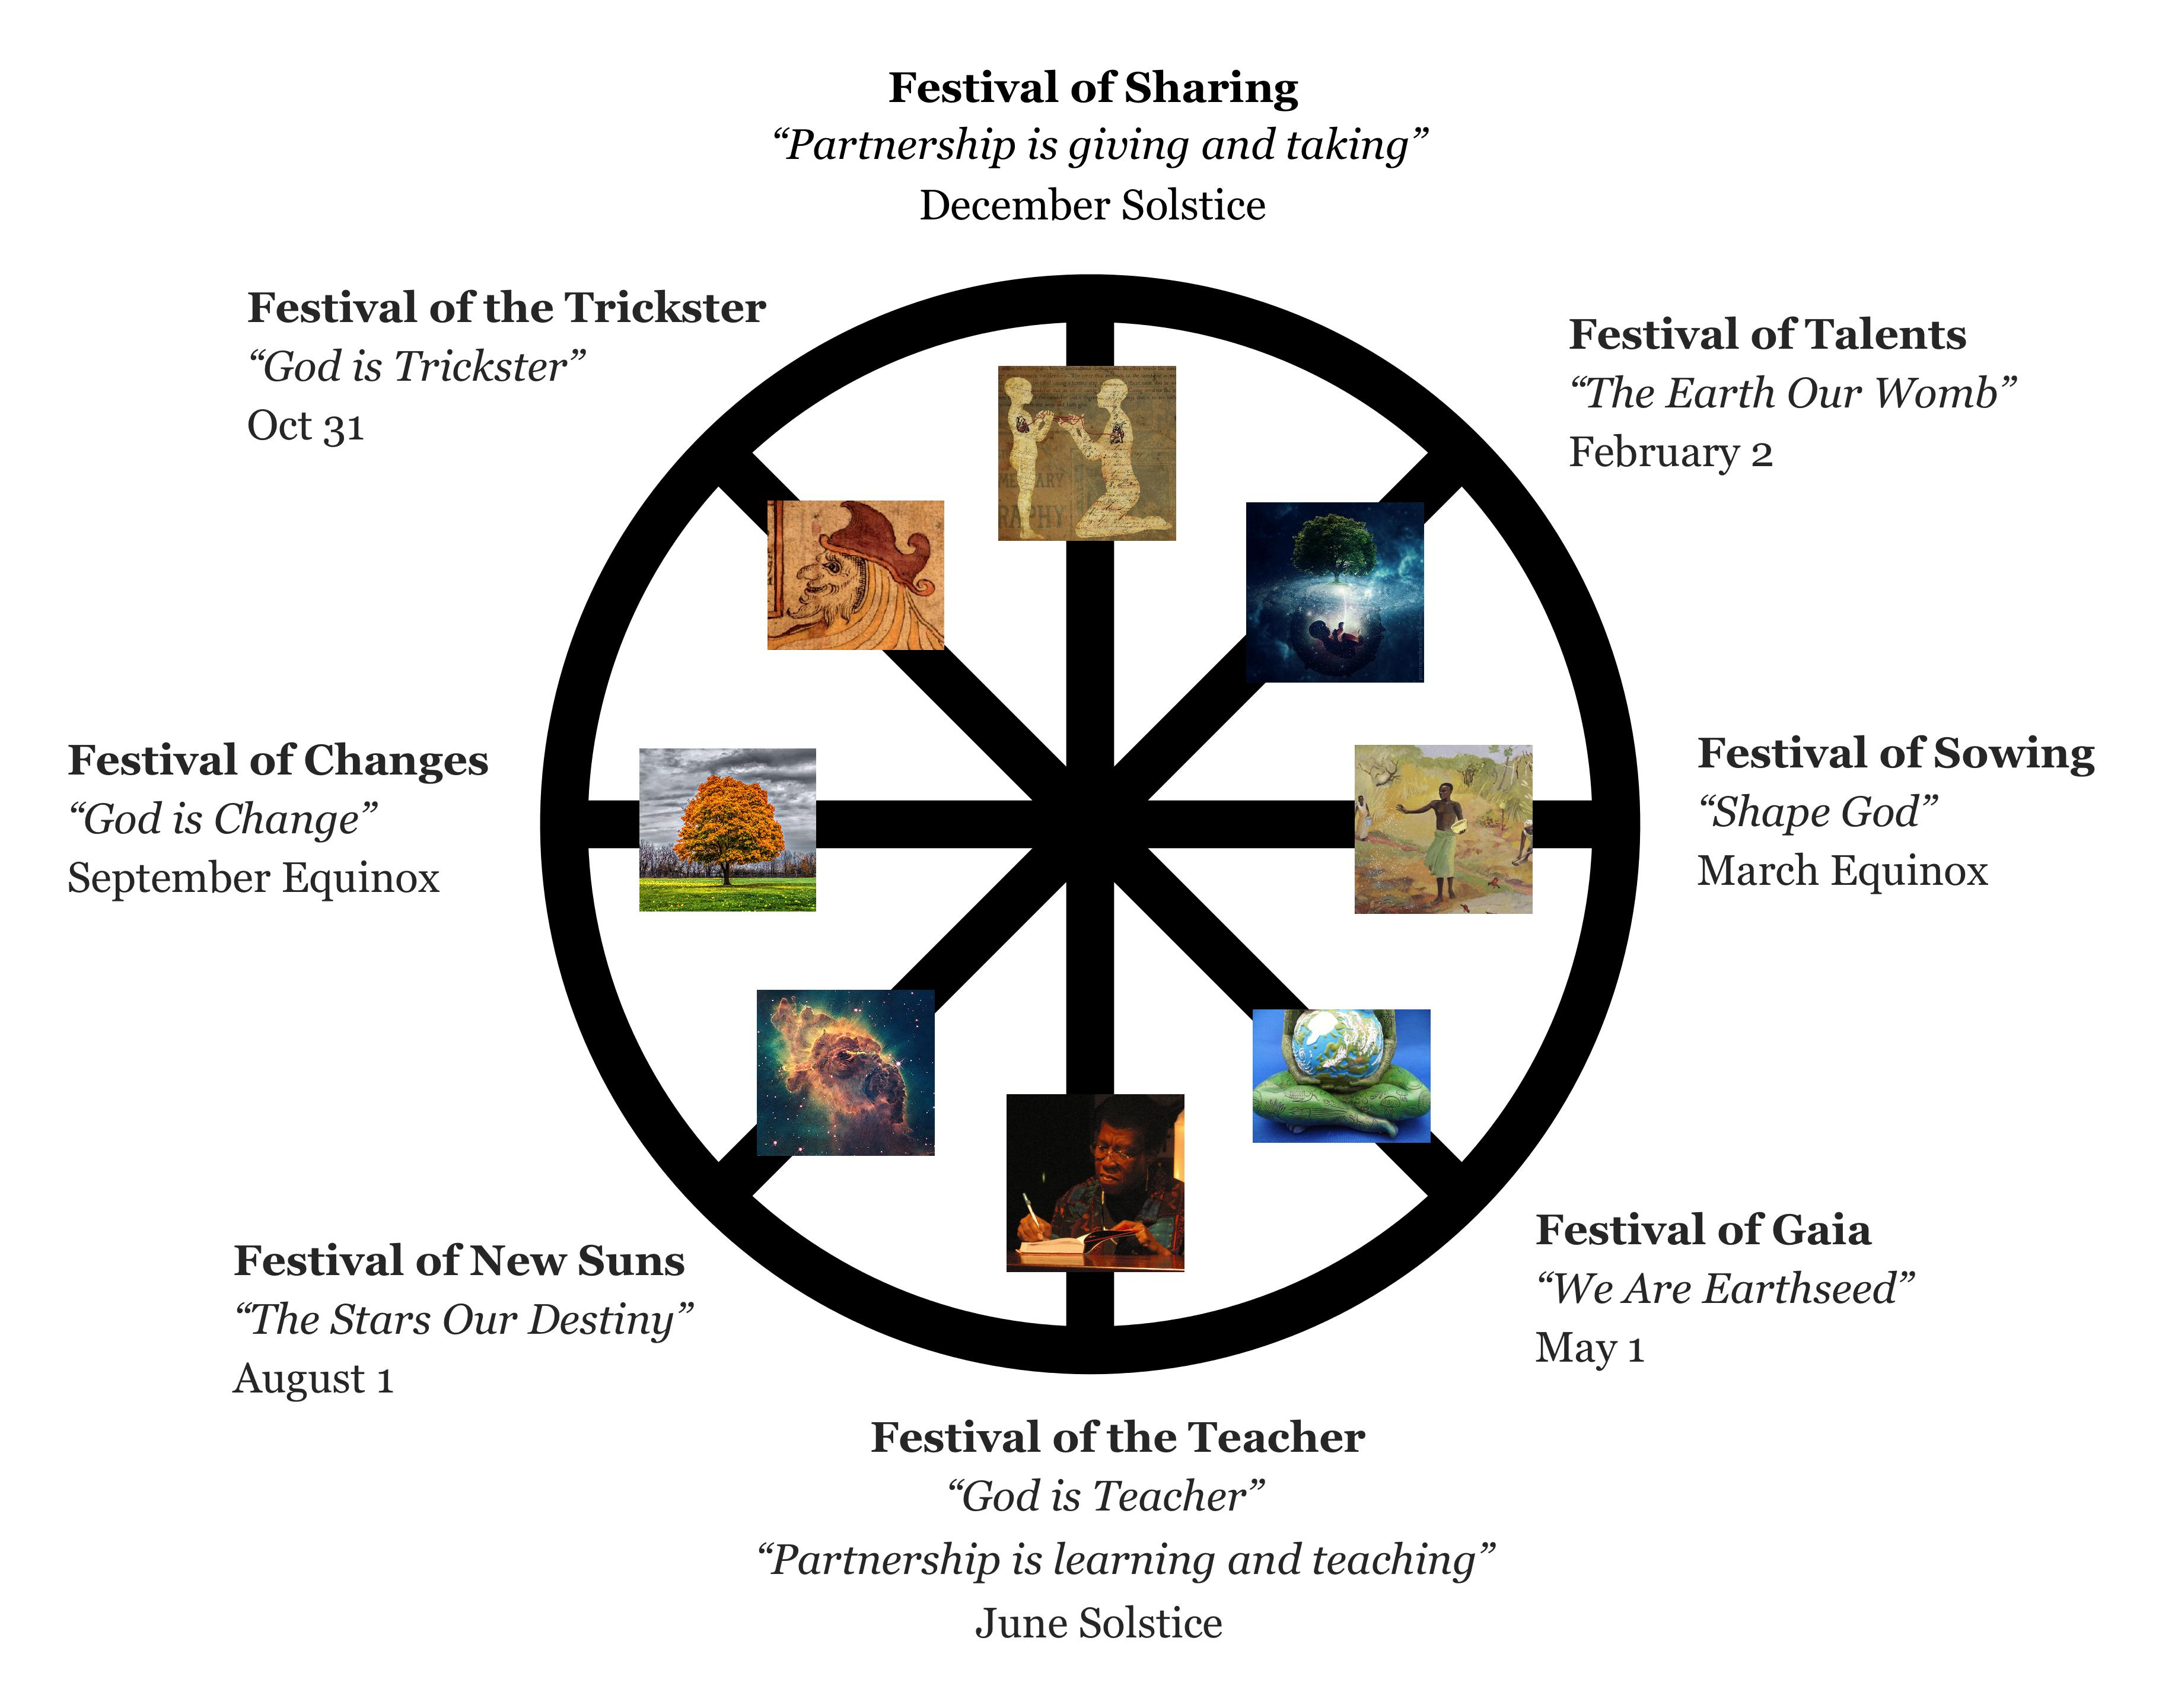 An Earthseed Solstice: Festival of the Teacher